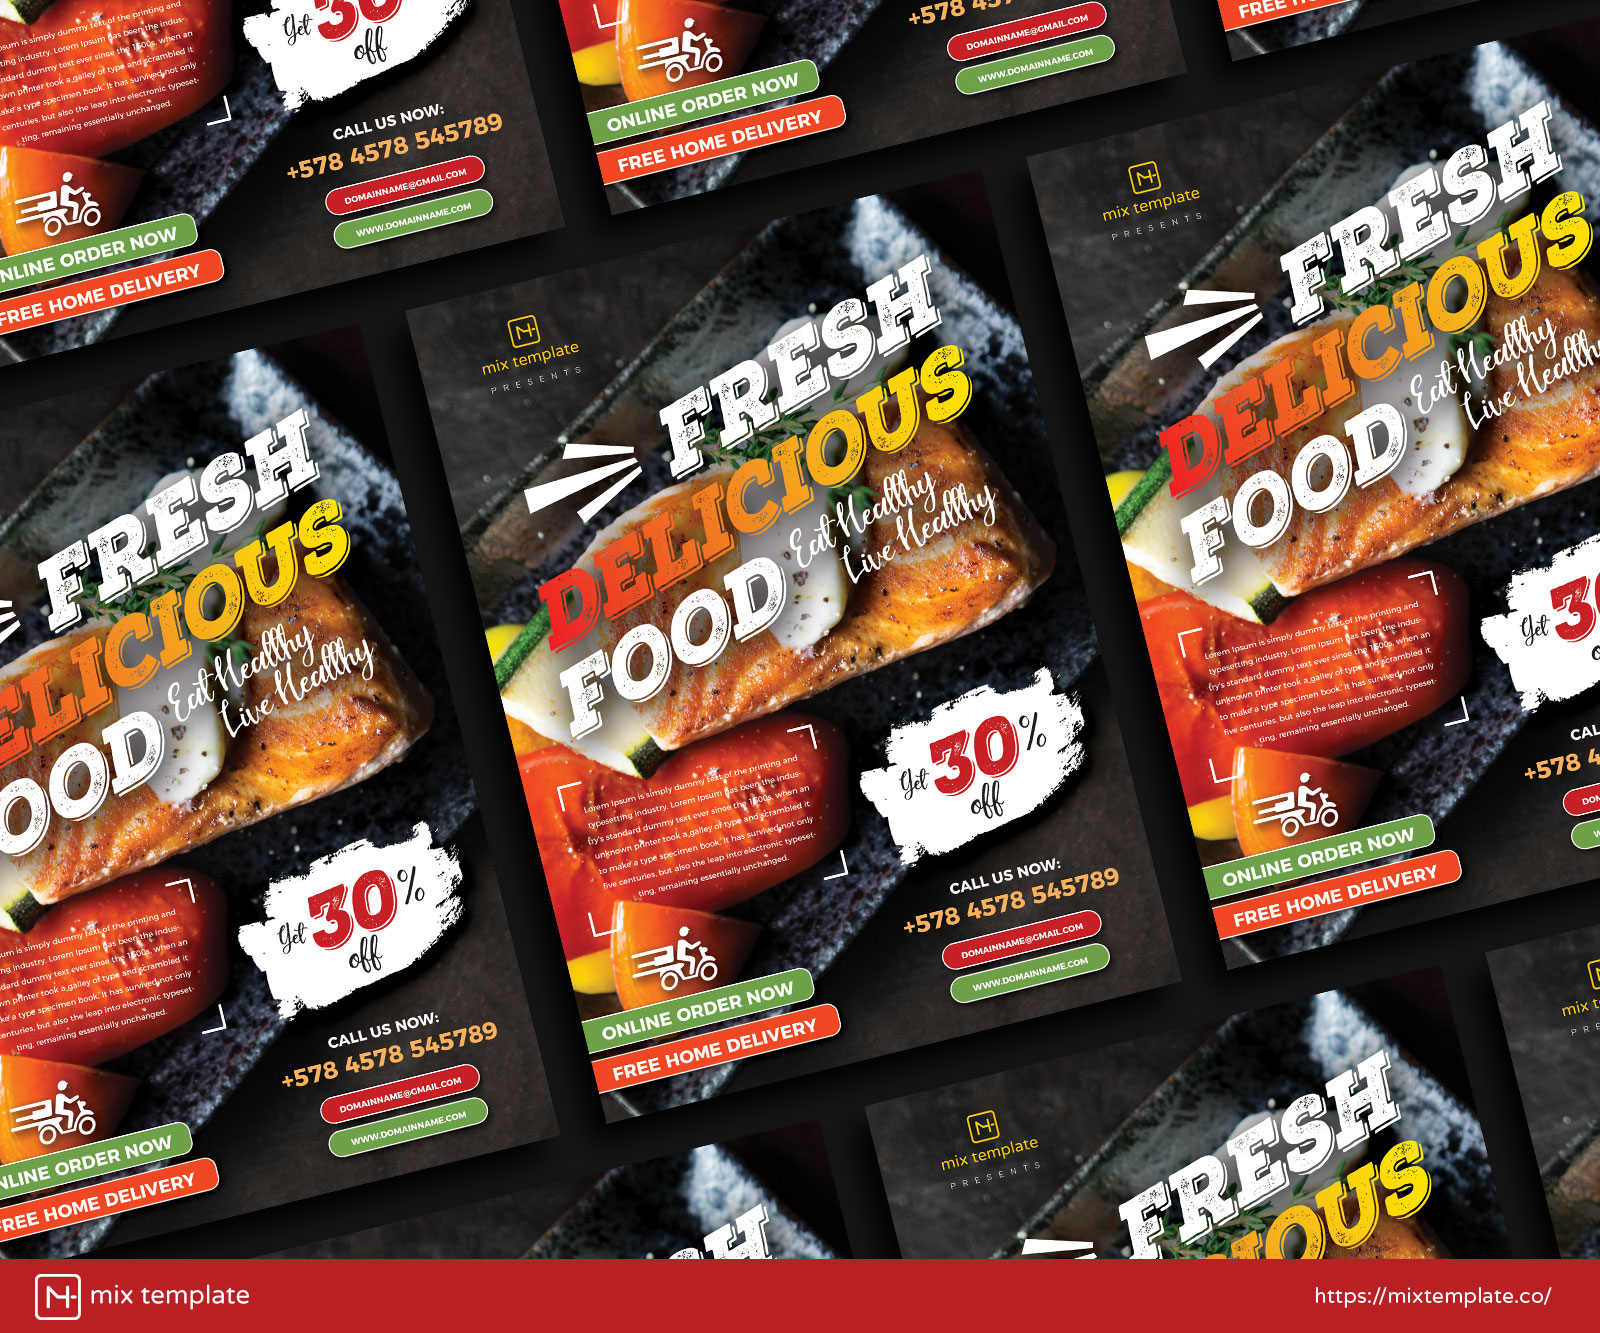 Free-Restaurant-Food-Flyer-Design-Template-of-2021-38